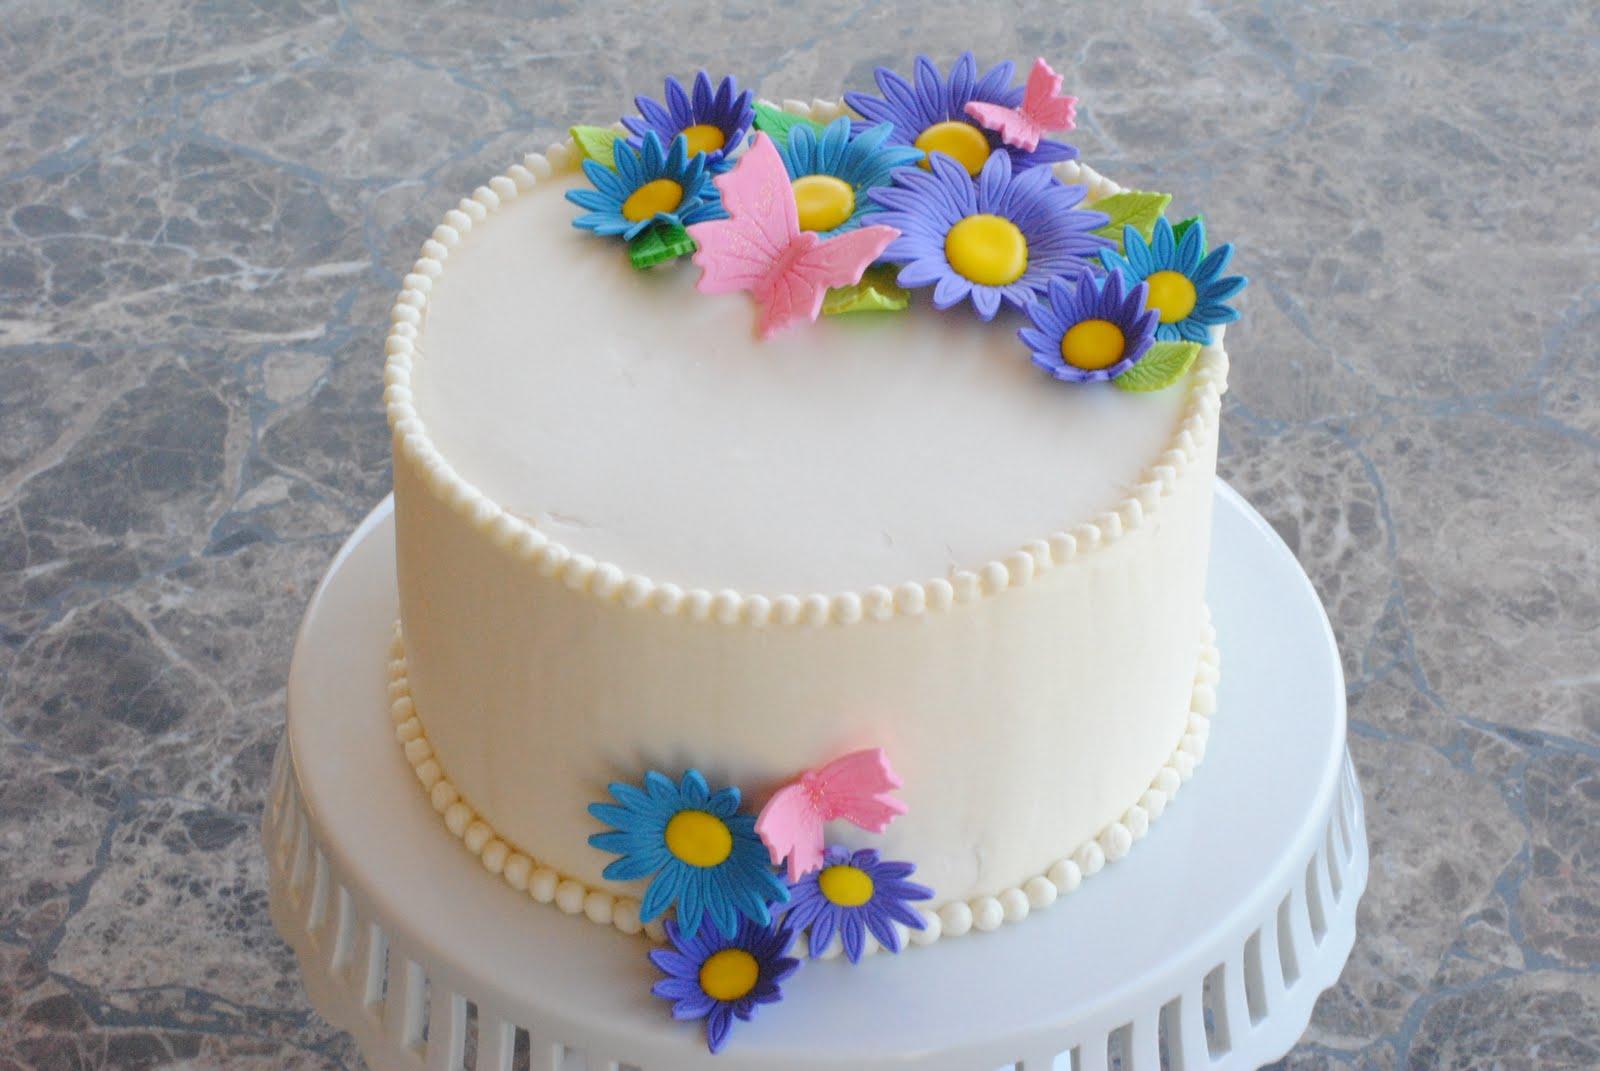 A Simple Birthday Cake My FaVoriTe CaKe PlaCe